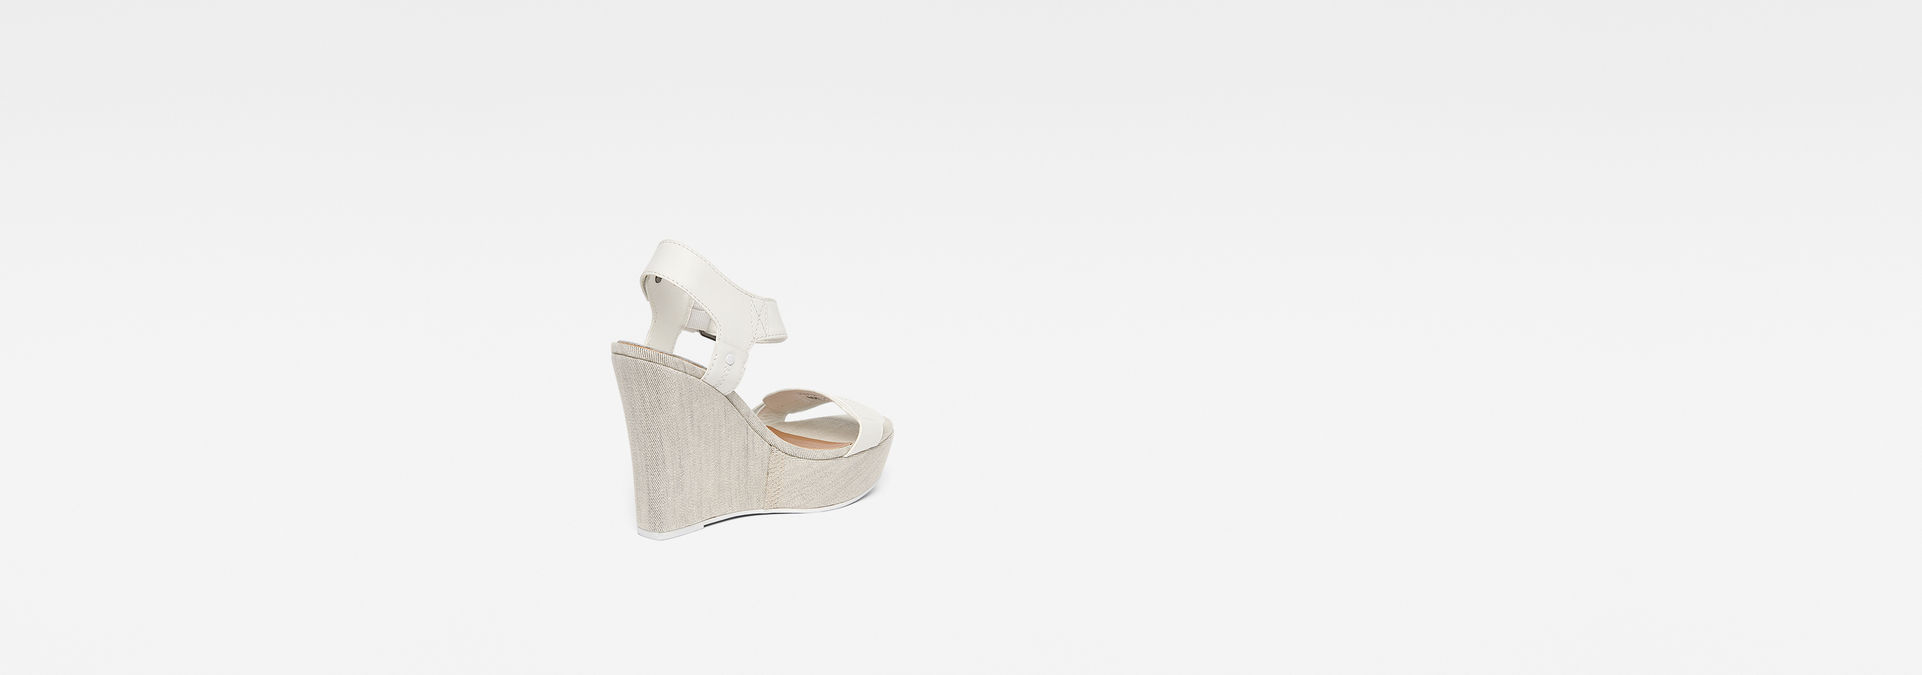 Star Wedge SandalsWhite Femmes G Raw® Claro 34jLR5A